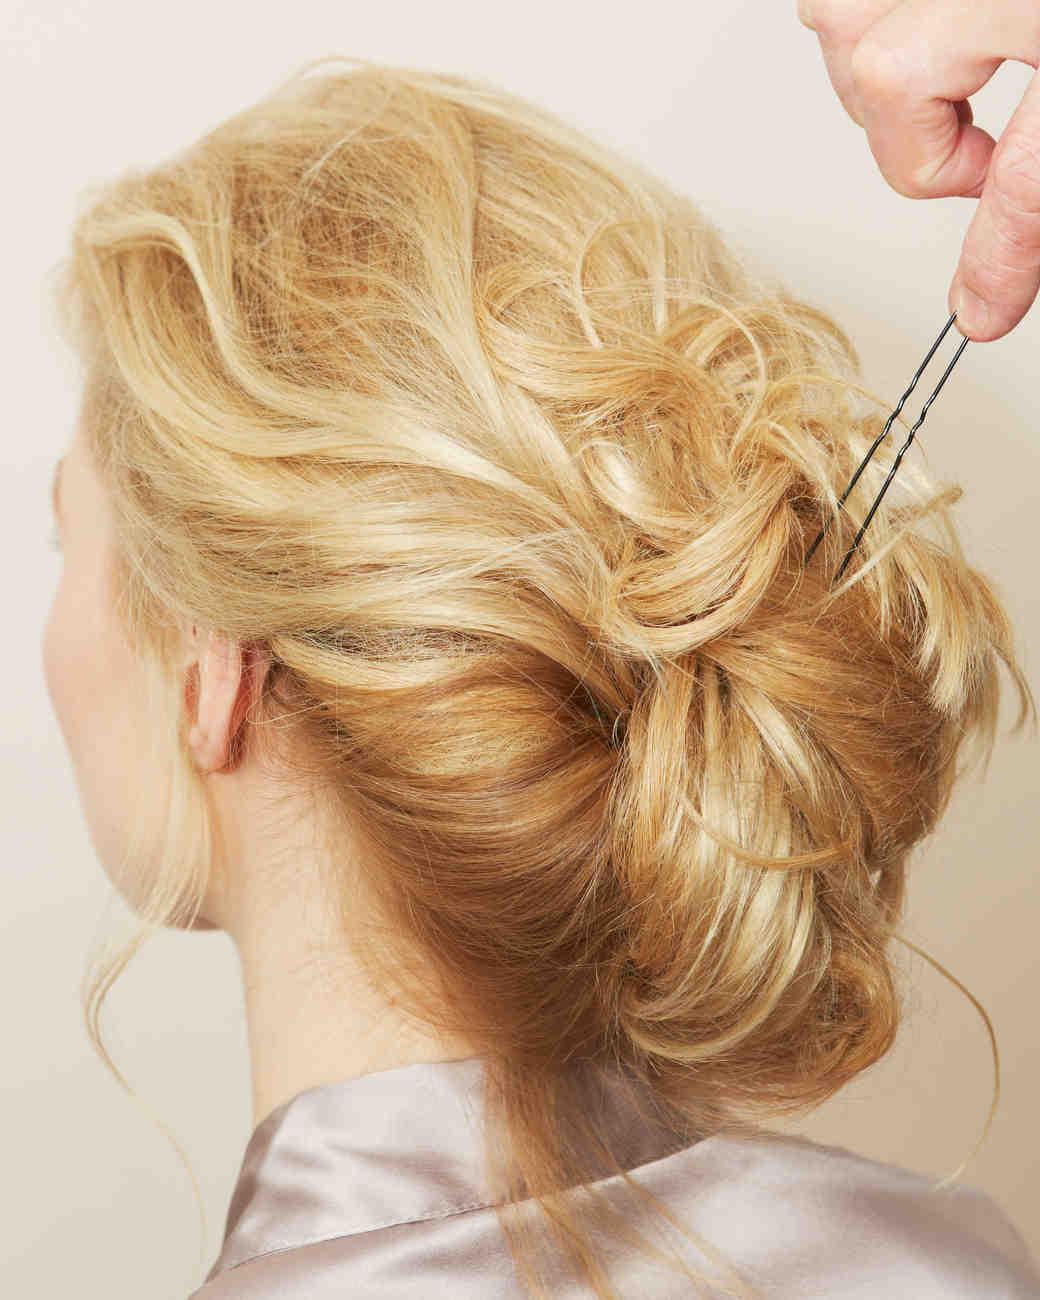 hair-prep-updo-758-wd110254.jpg